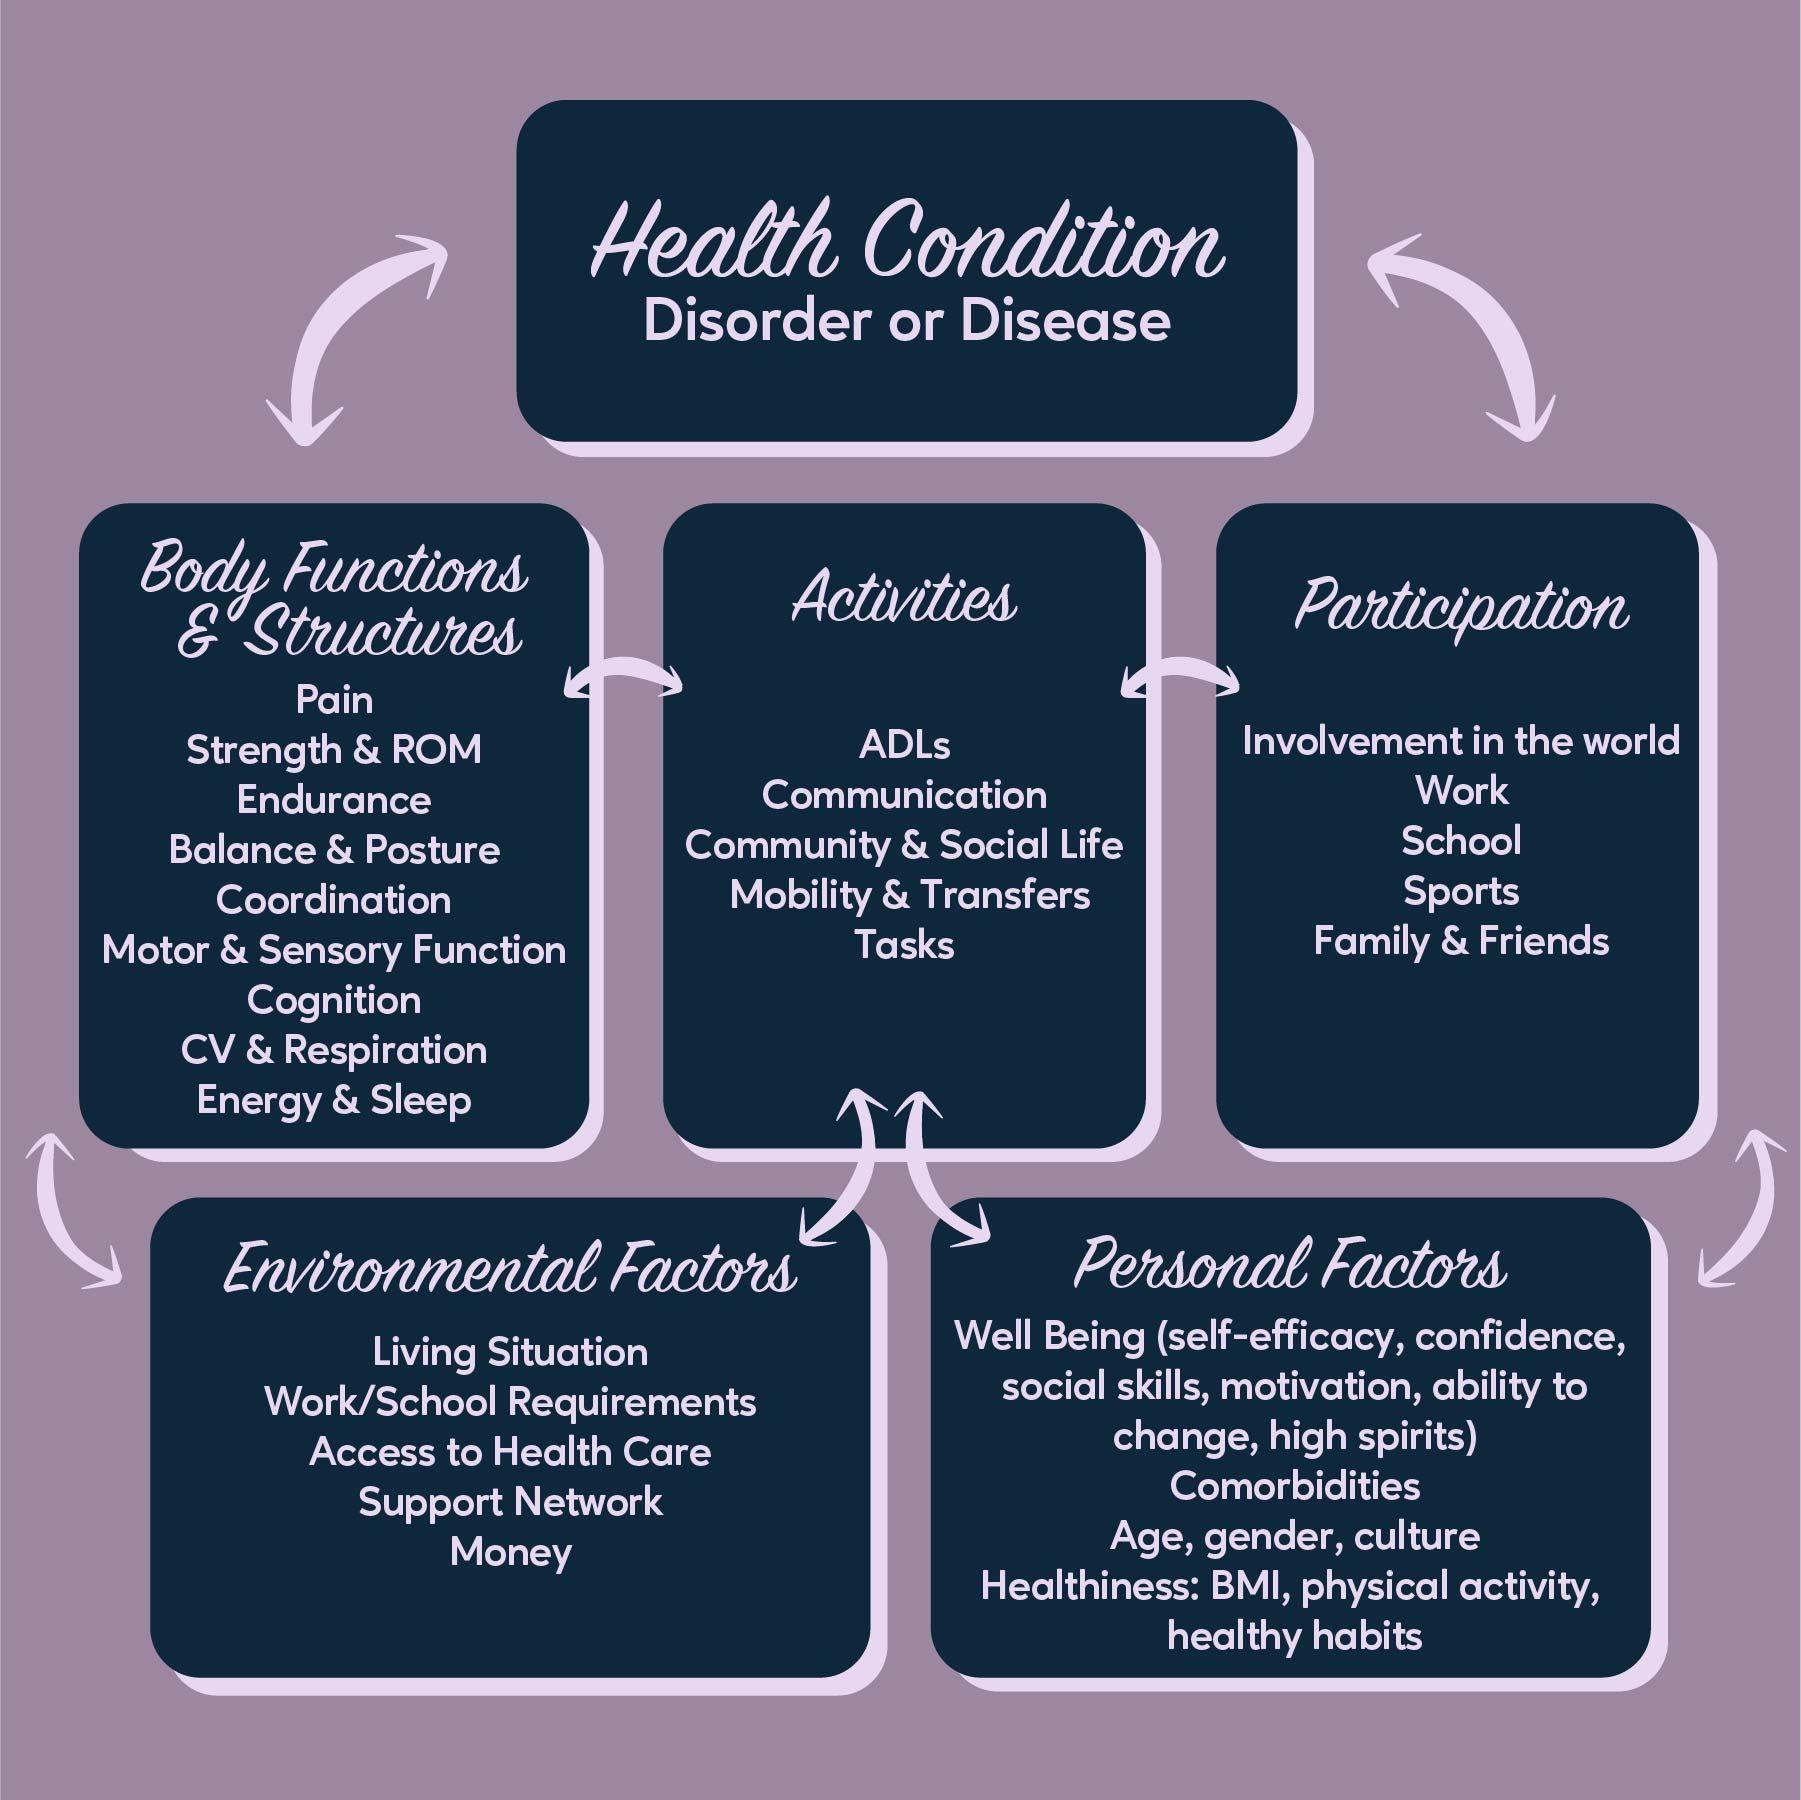 Icf Model Social Life Disease Cardiovascular Health